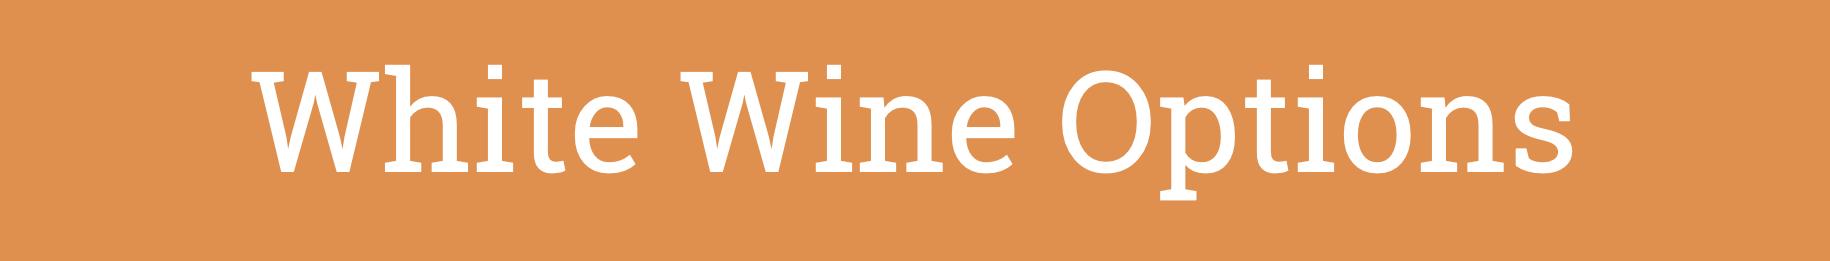 View White Wine Options